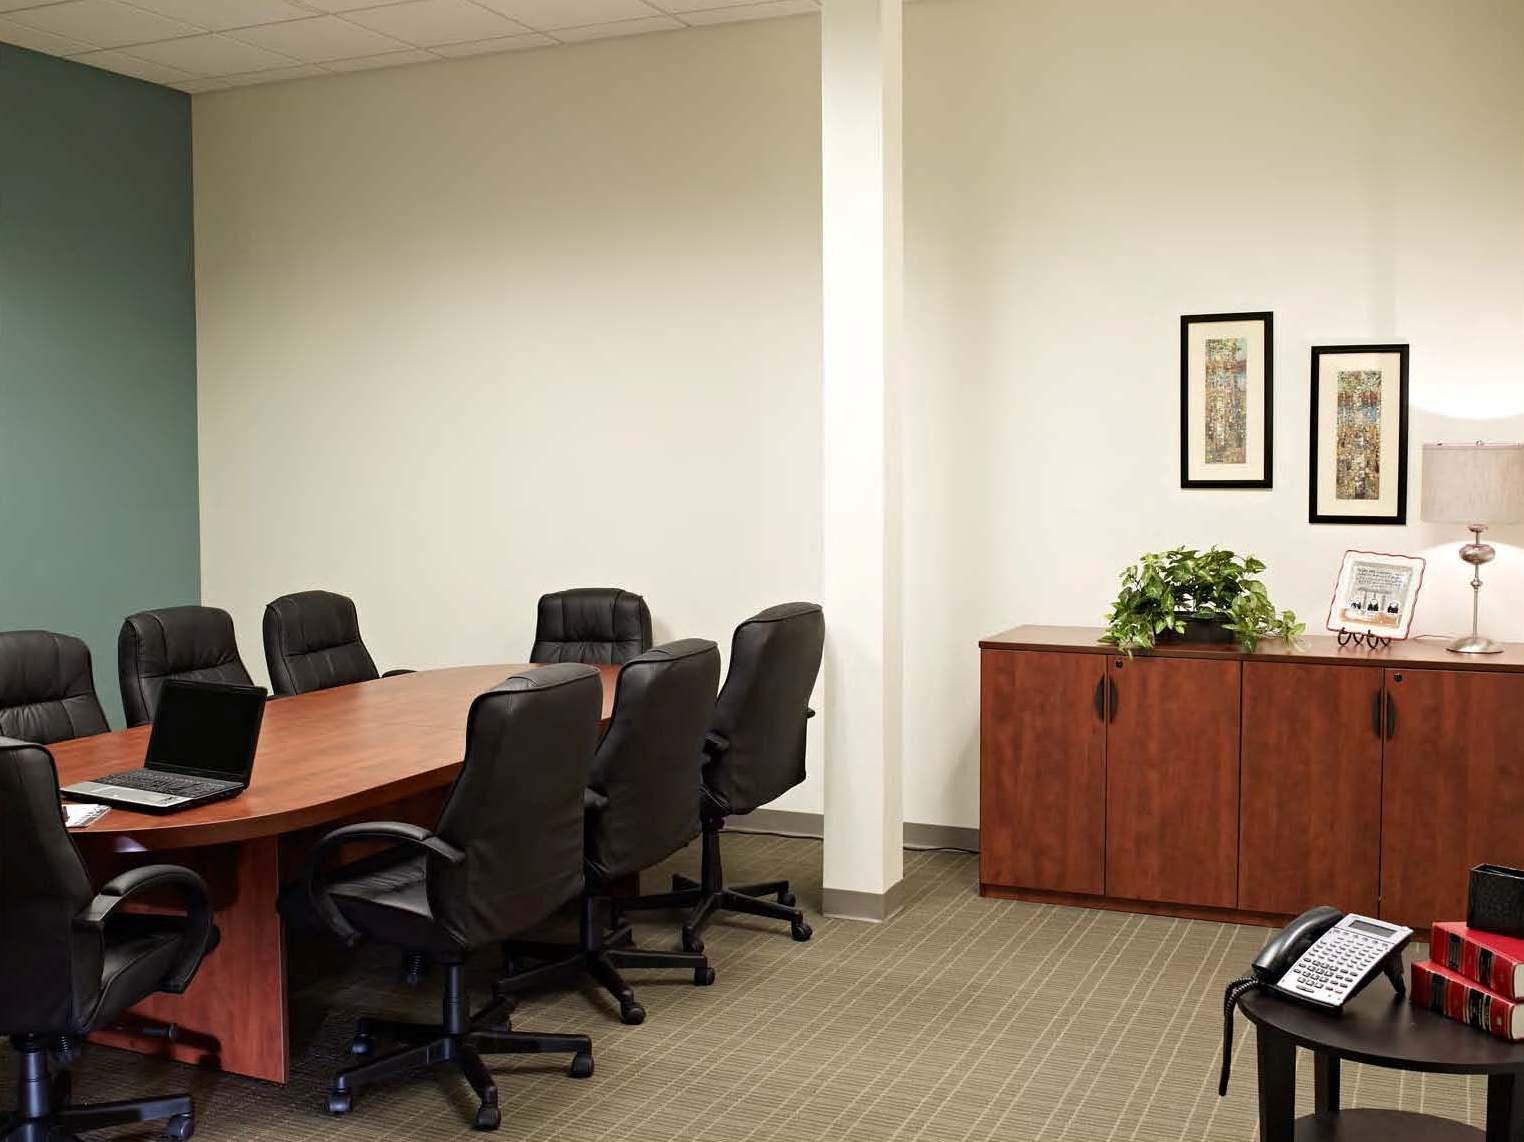 John Marshall Law School Atlanta >> Meeting & Conference Rooms - Atlanta's John Marshall Law School